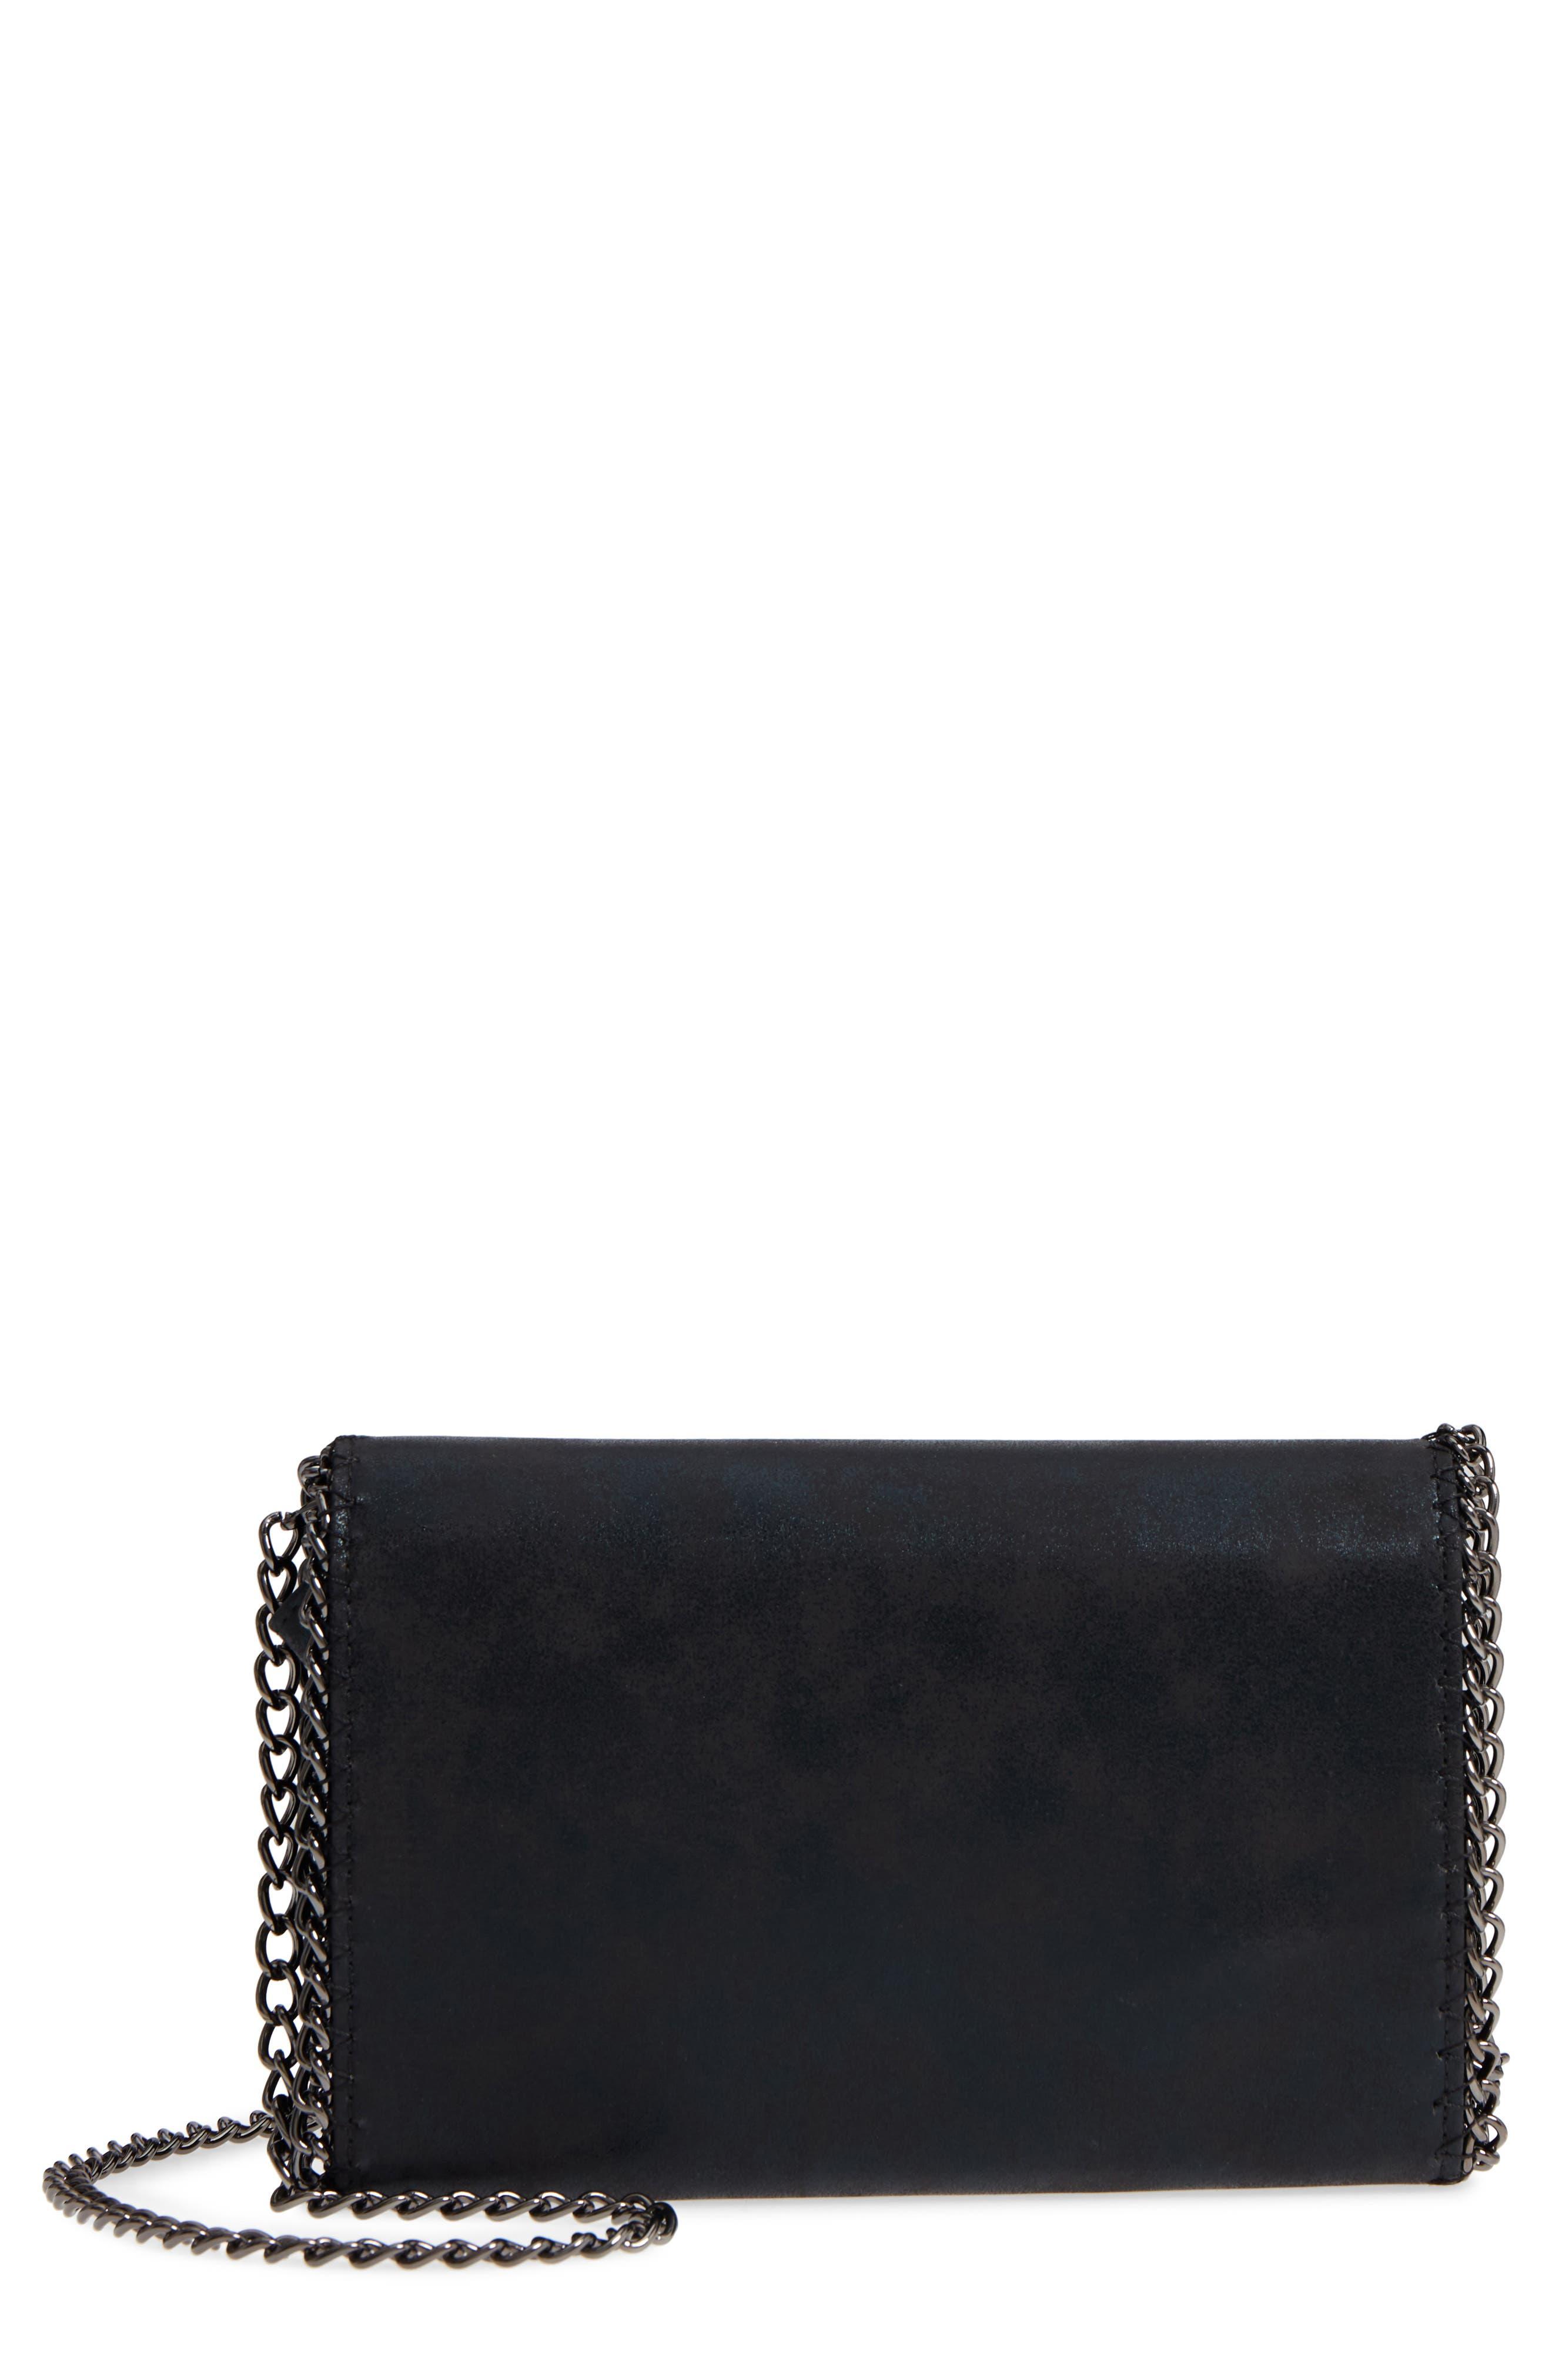 Image of Chelsea28 Metallic Crossbody Wallet